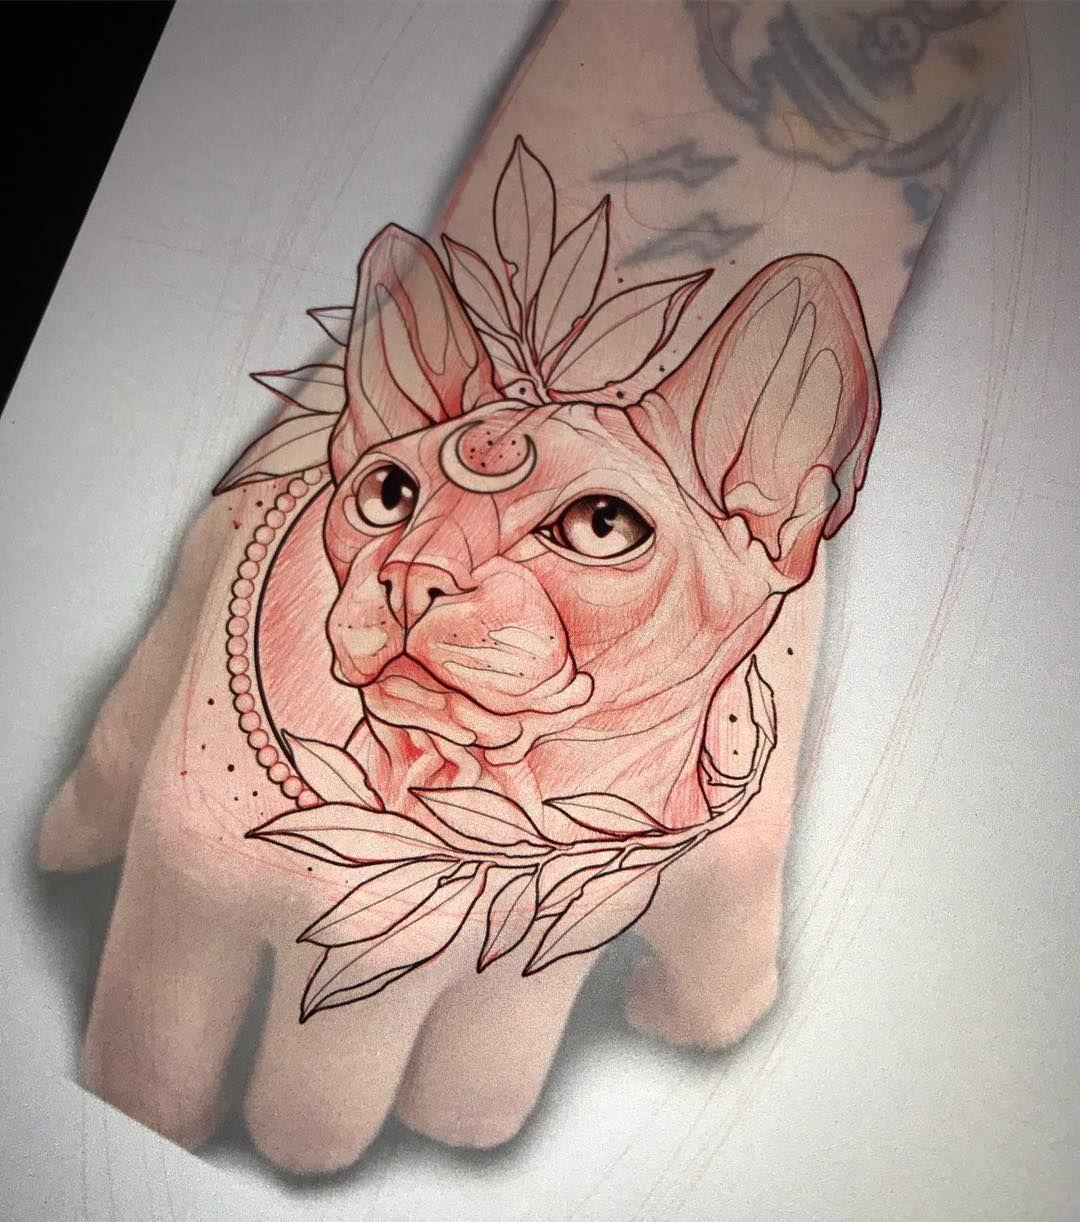 ???? Another one for @milanotattooconvention | neo traditional tattoo sleeve ideas flash art #milanotattooconvention #tattoo #artwork #handtattoo #doodle #sphynxtattoo #artistspotlight #neotraditionaltattoo